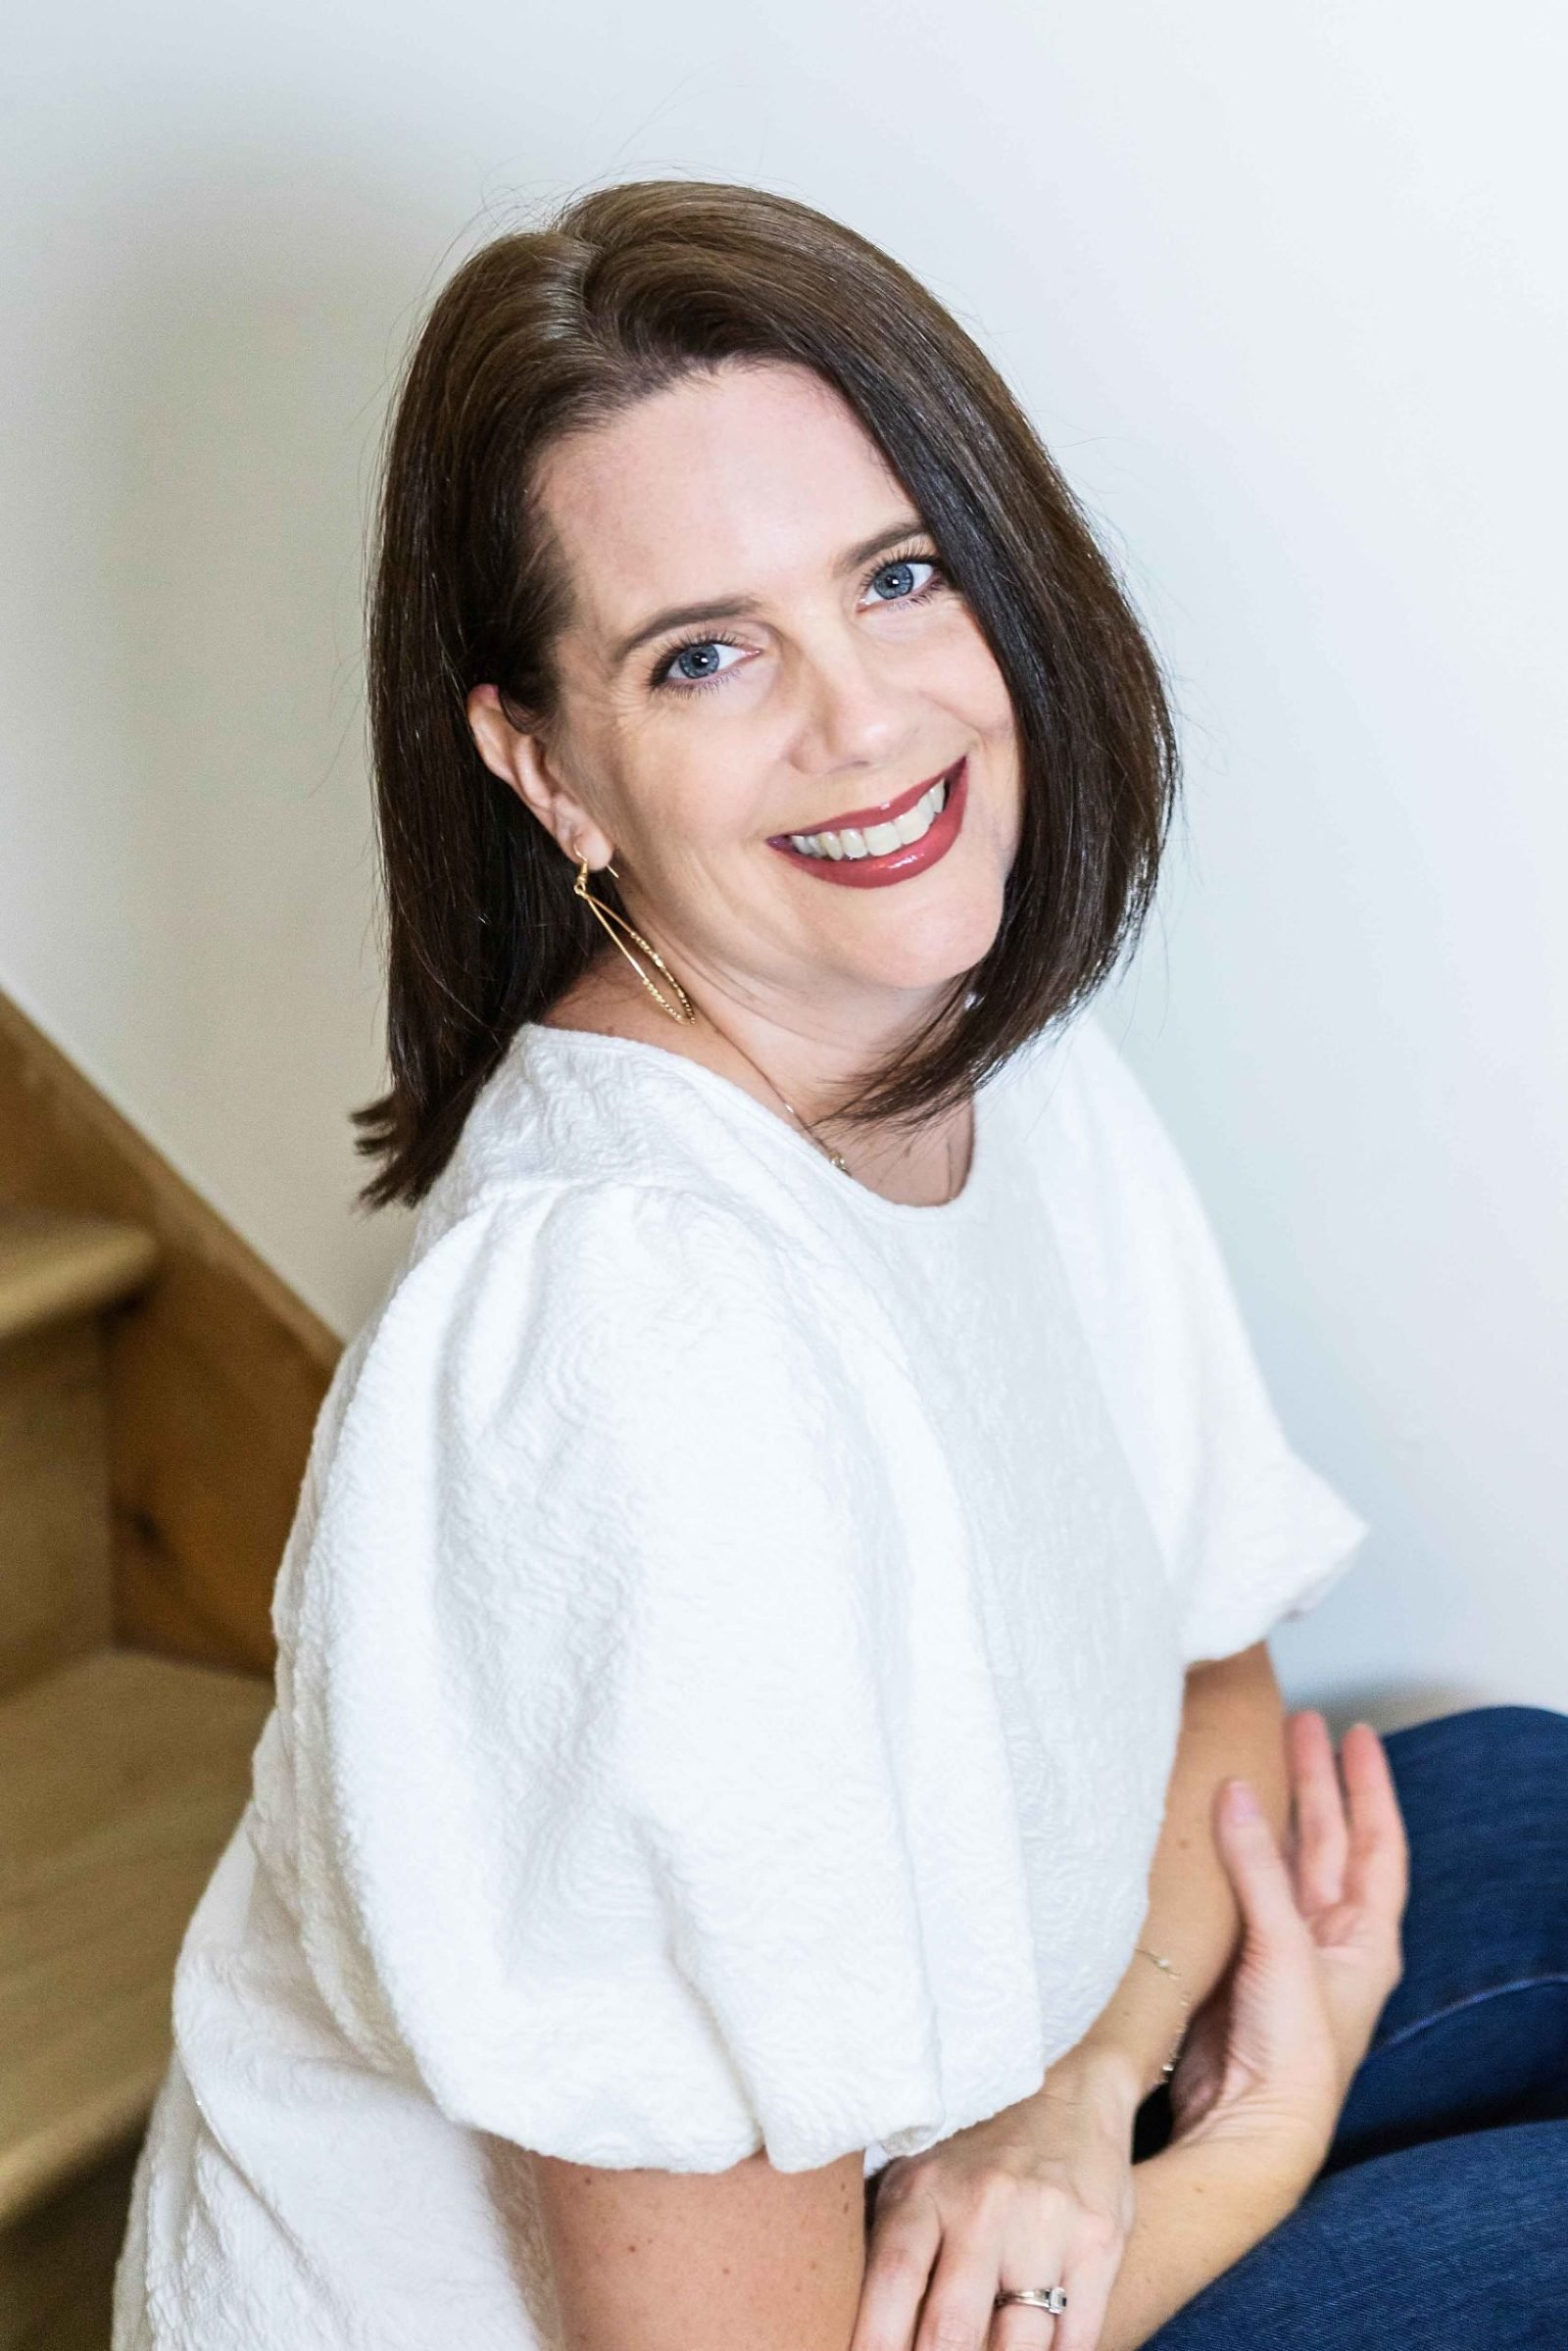 Kara Powell of Kara Powell Photography